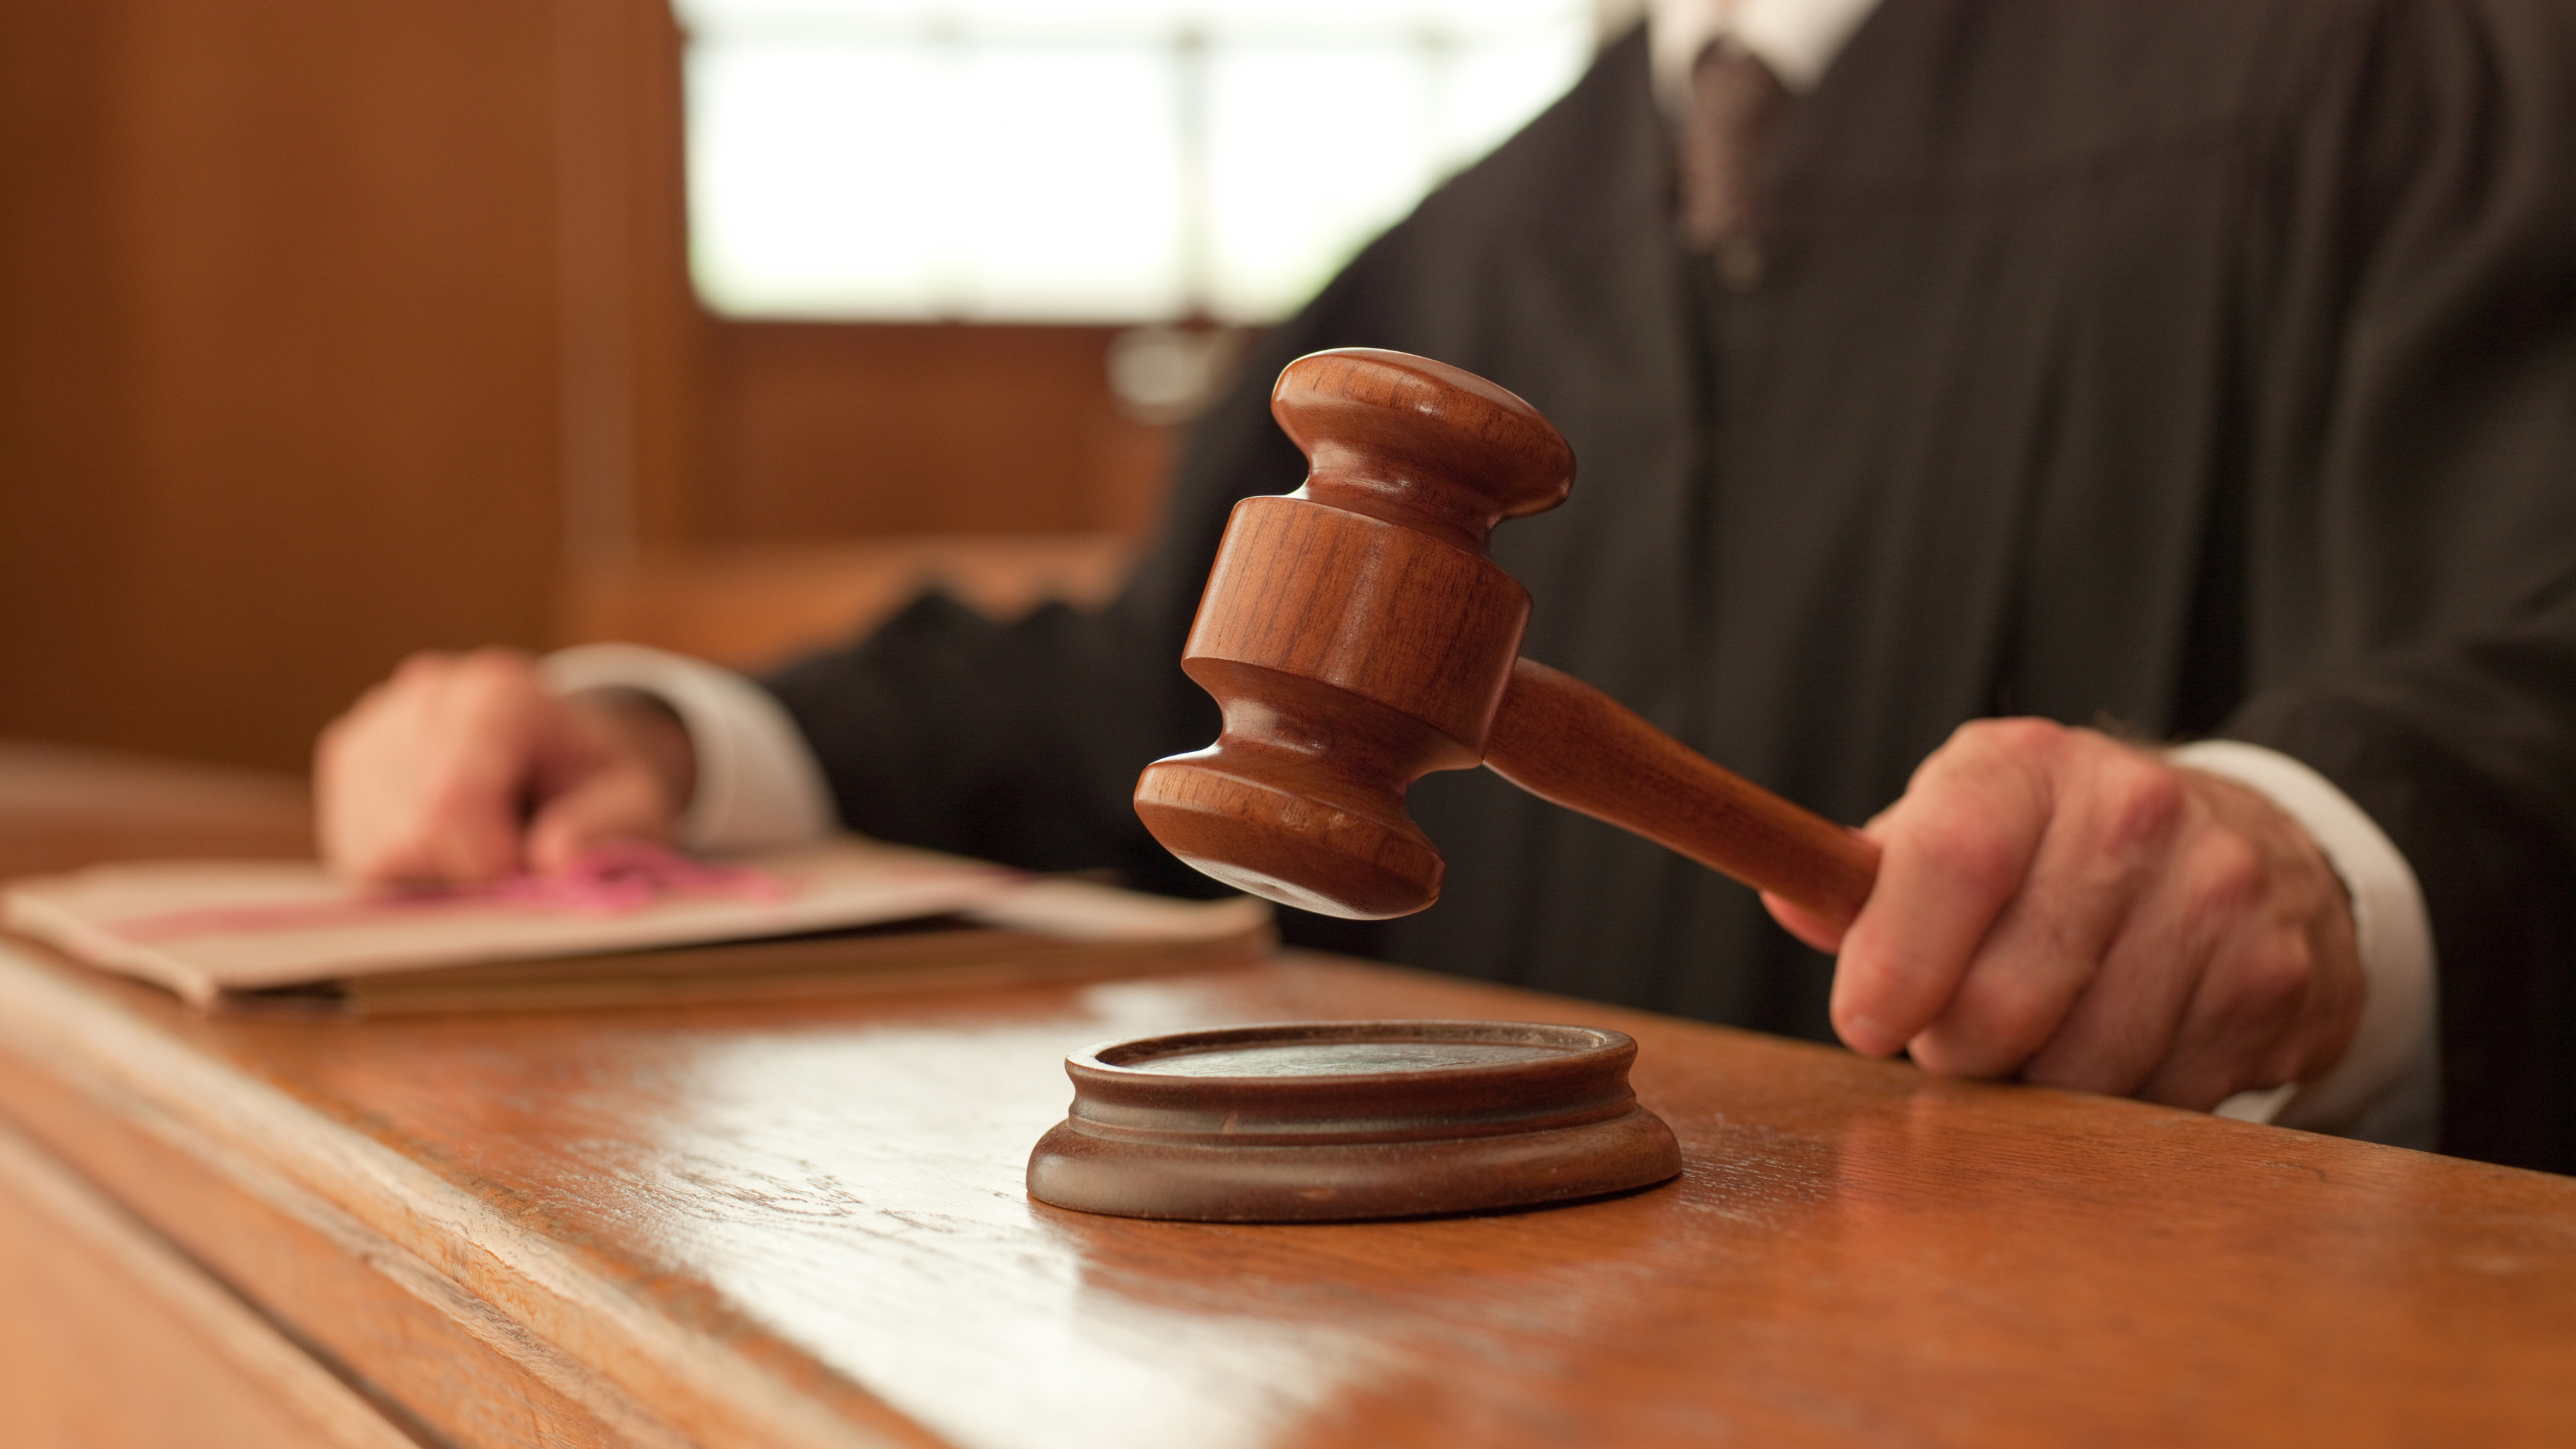 judge rechter 16x9